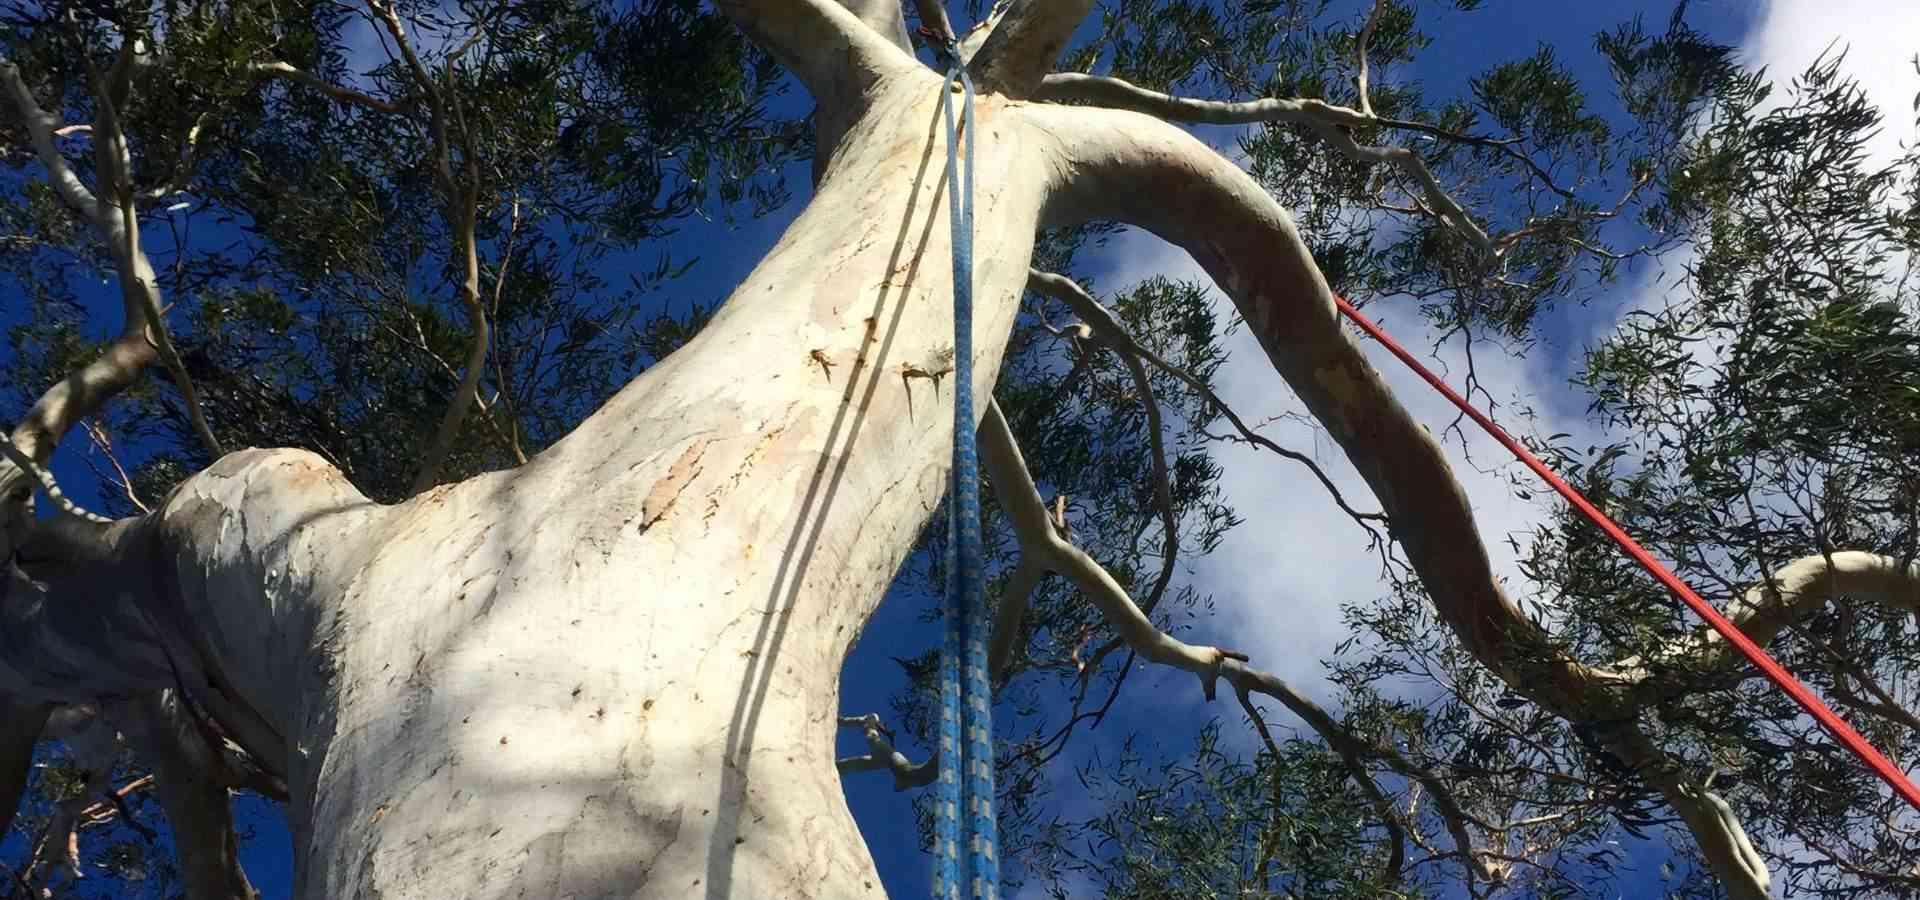 Tree Pruning__1501812451_115.70.206.58